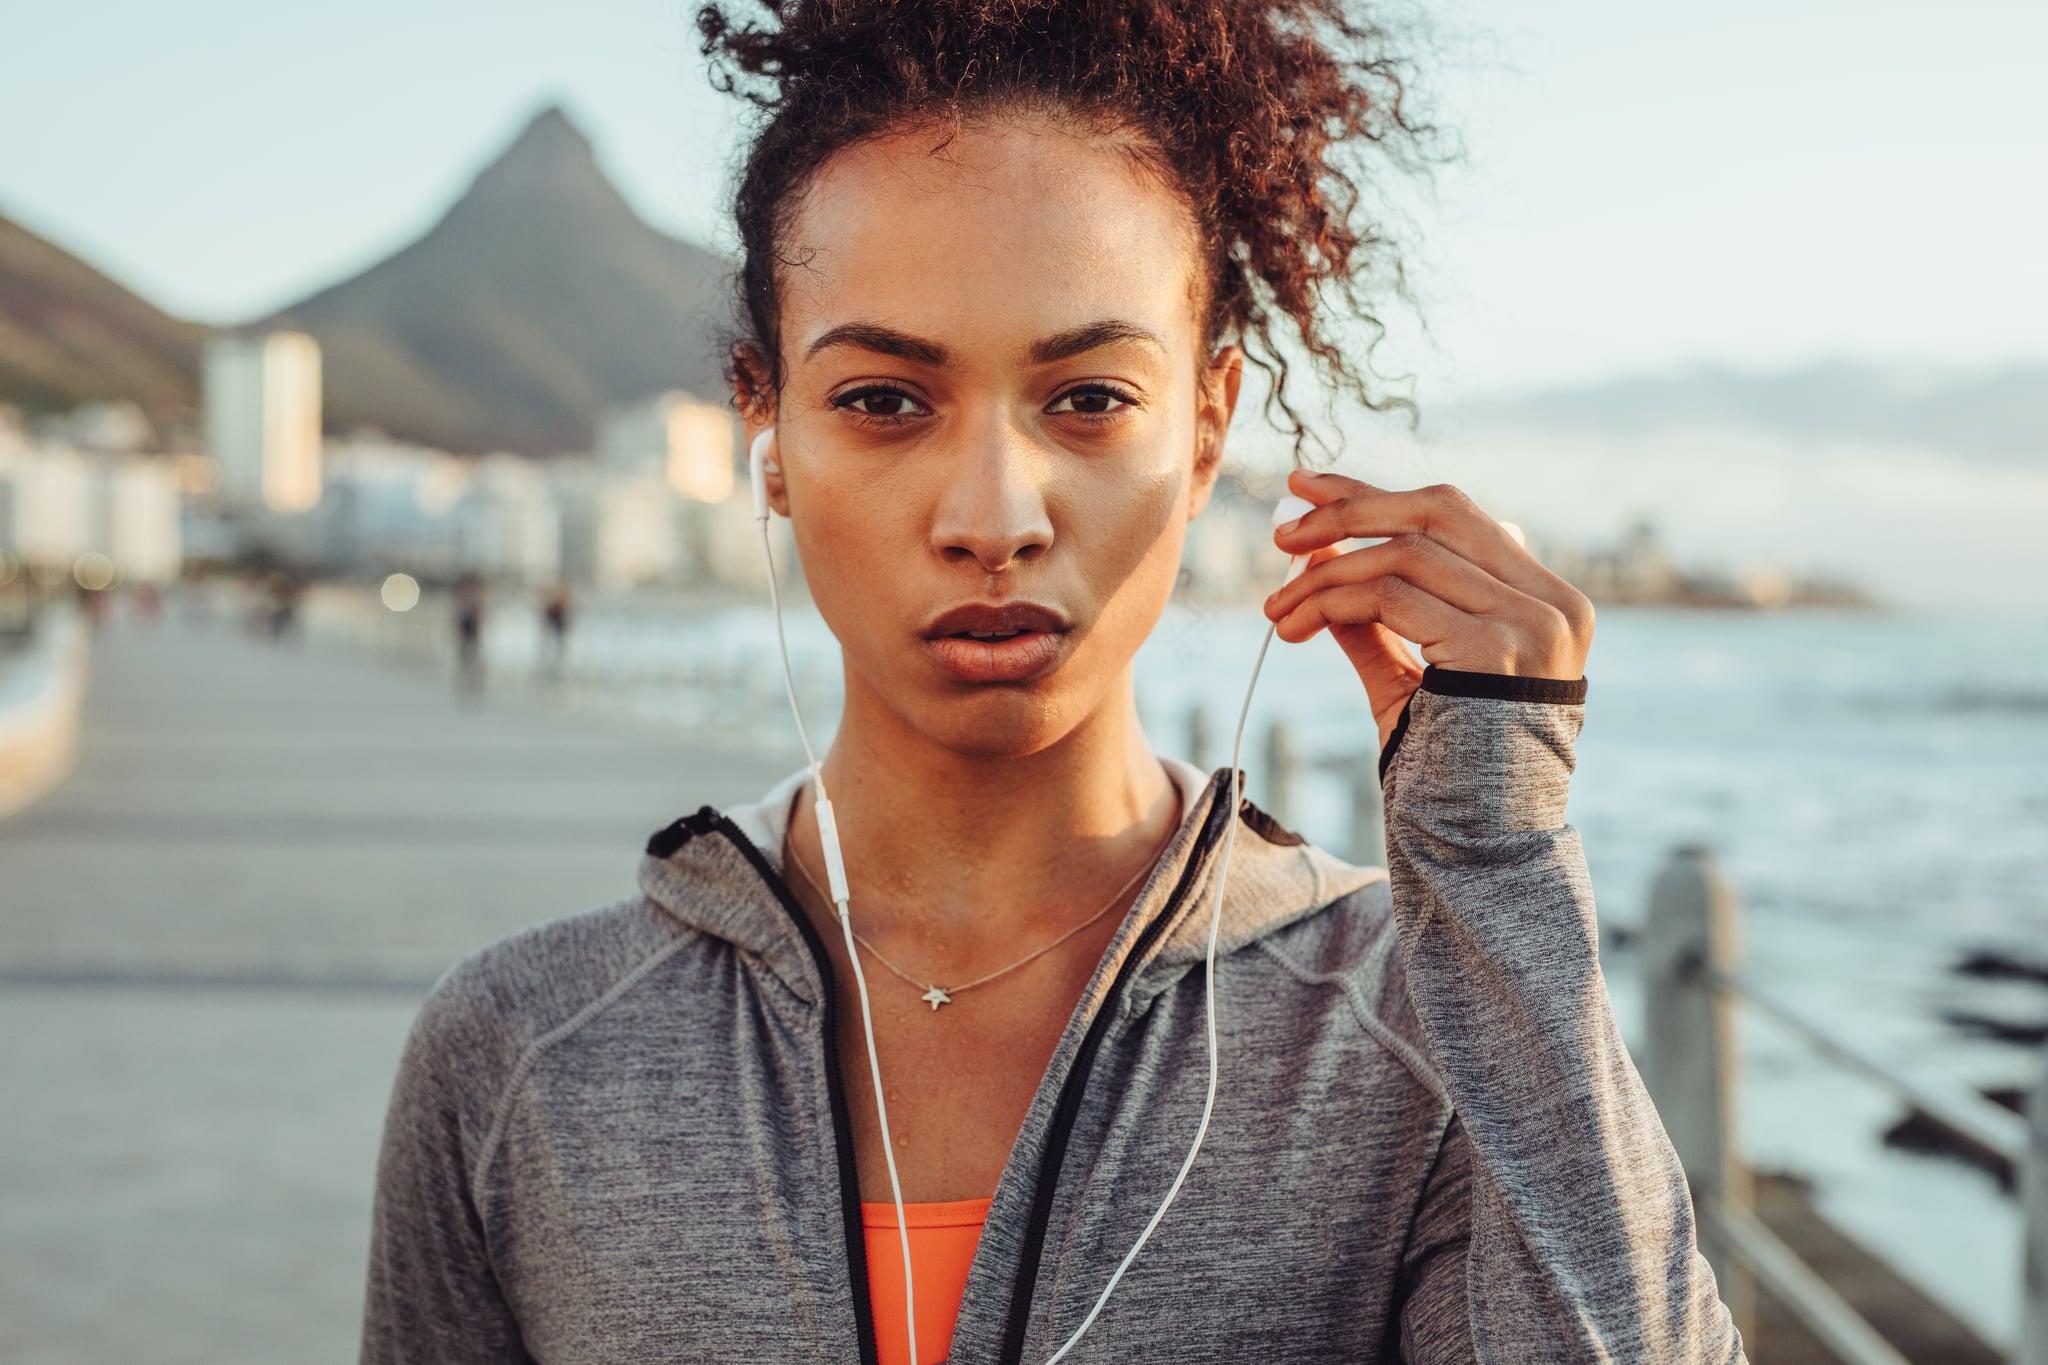 guided run benefits